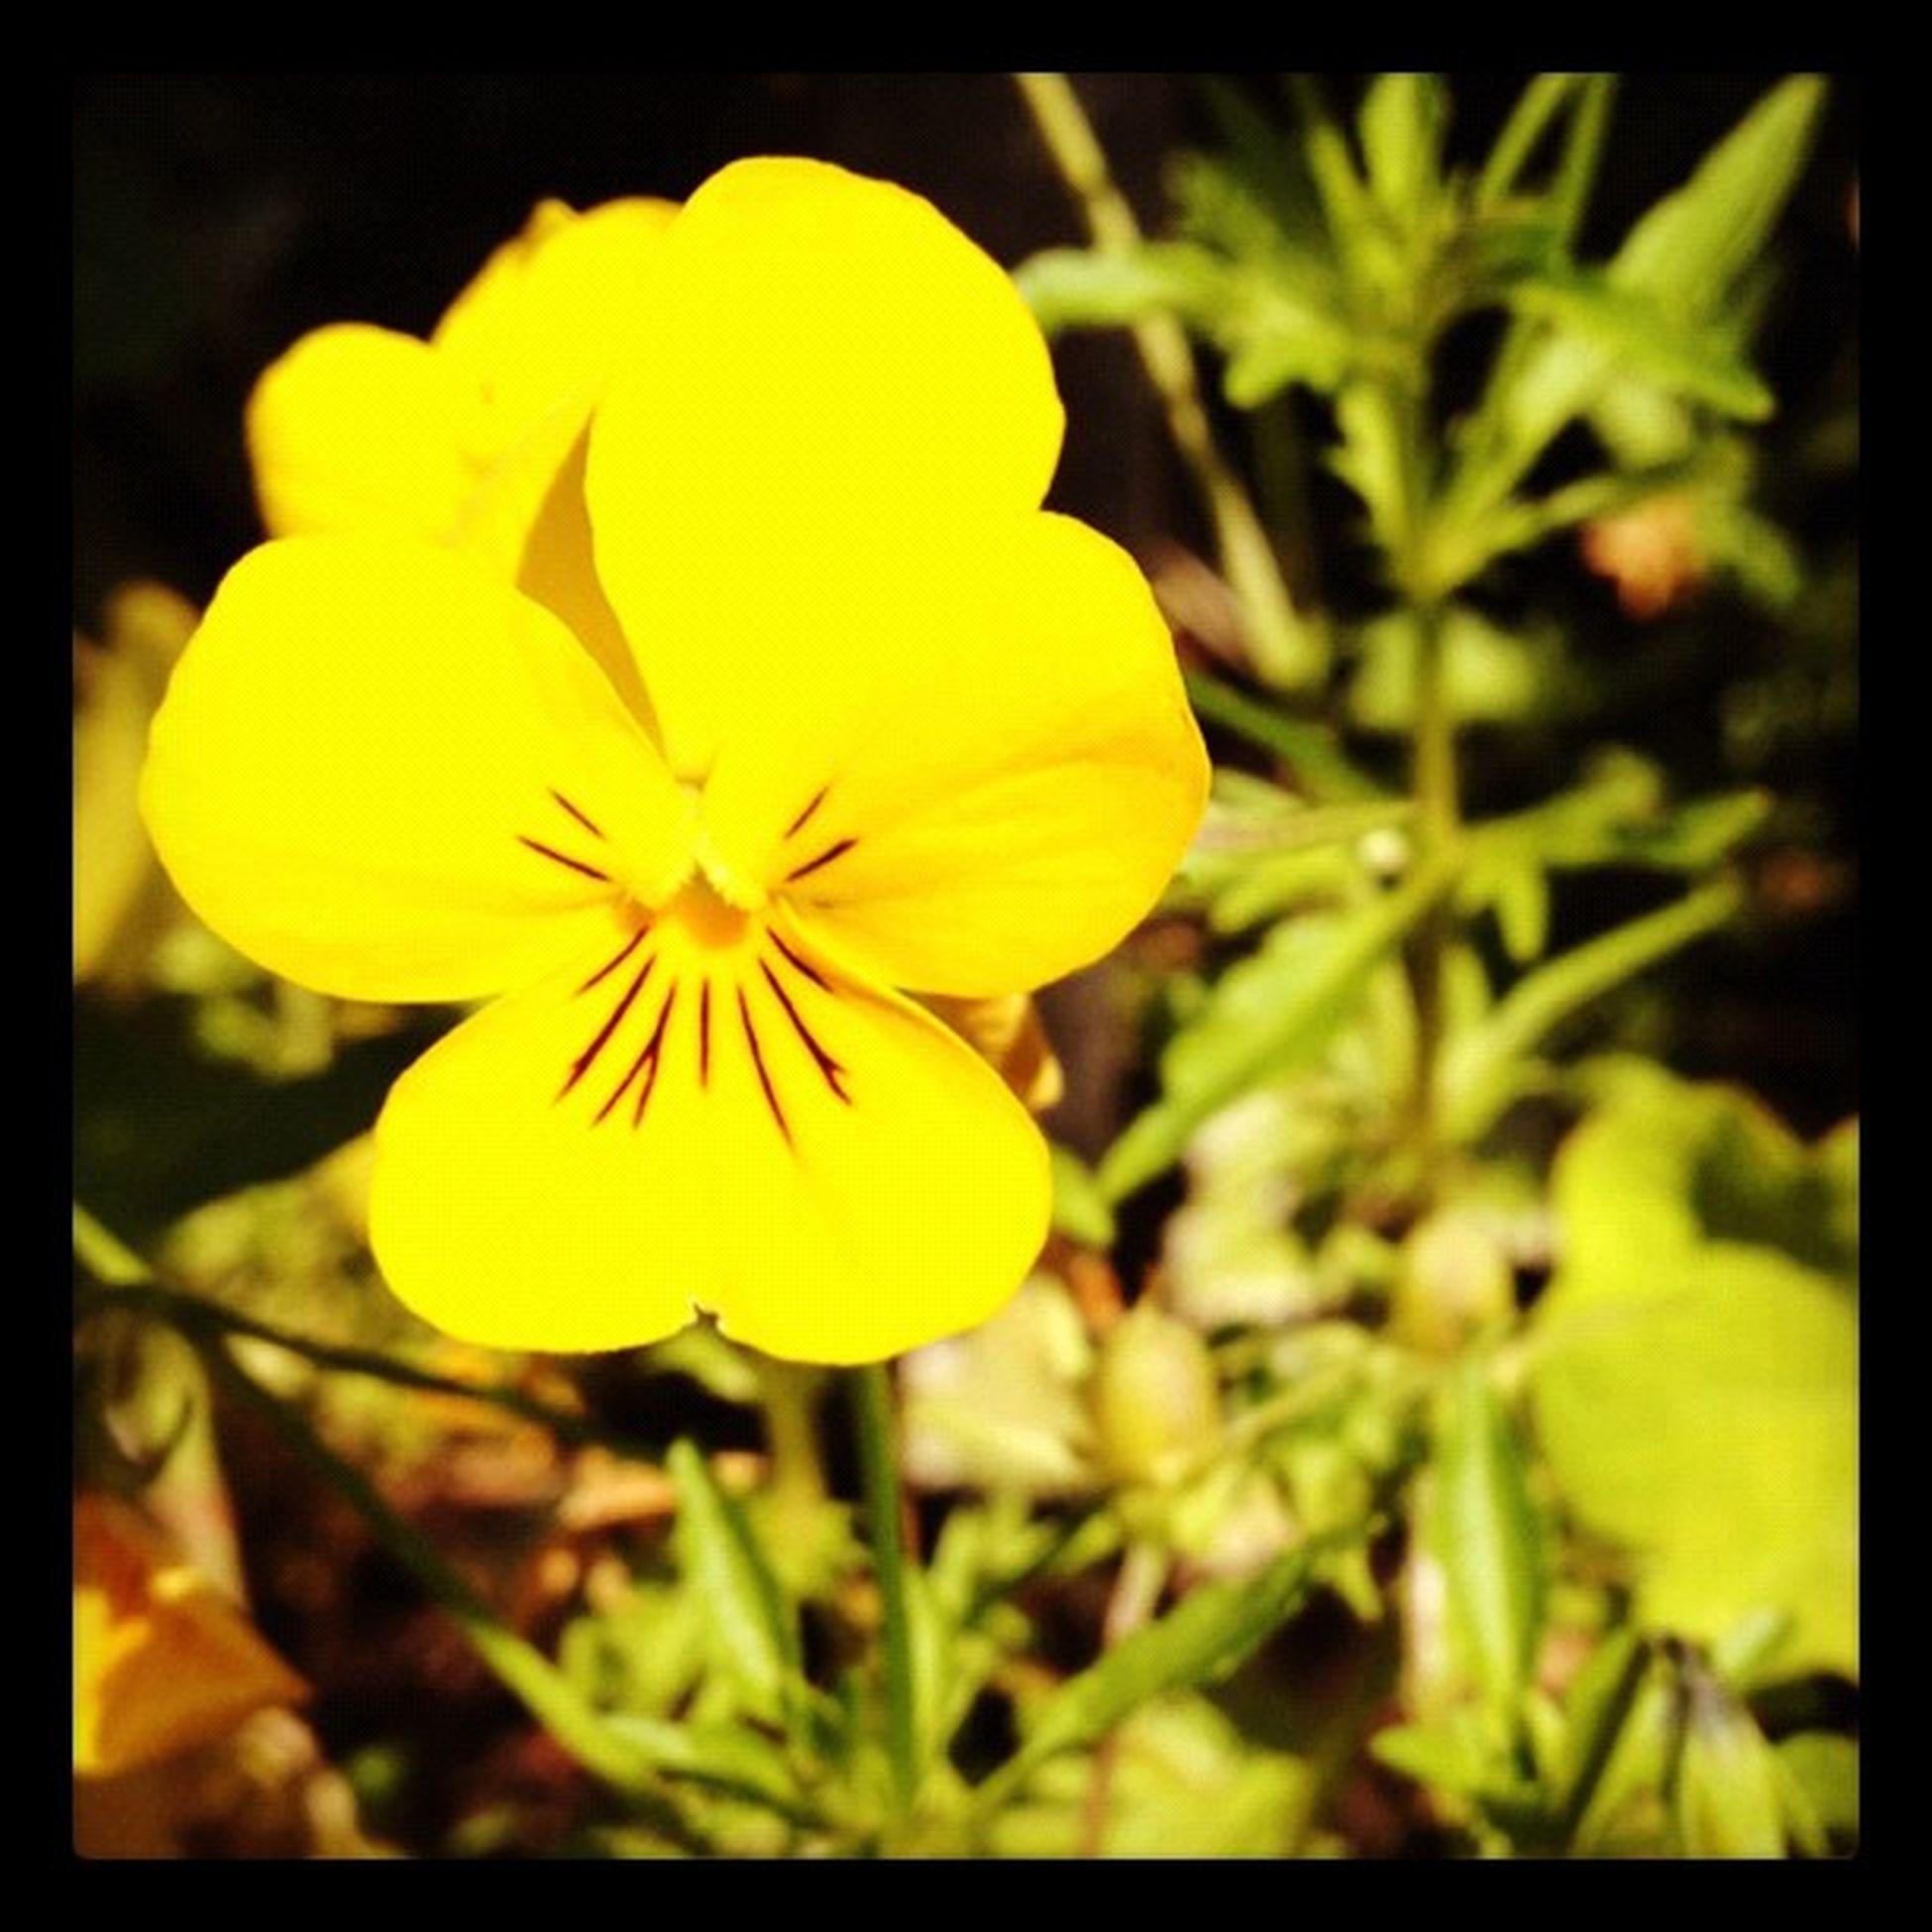 Photooftheday InstaCC Instaccplaywithphotosd5 Macro_power_hour